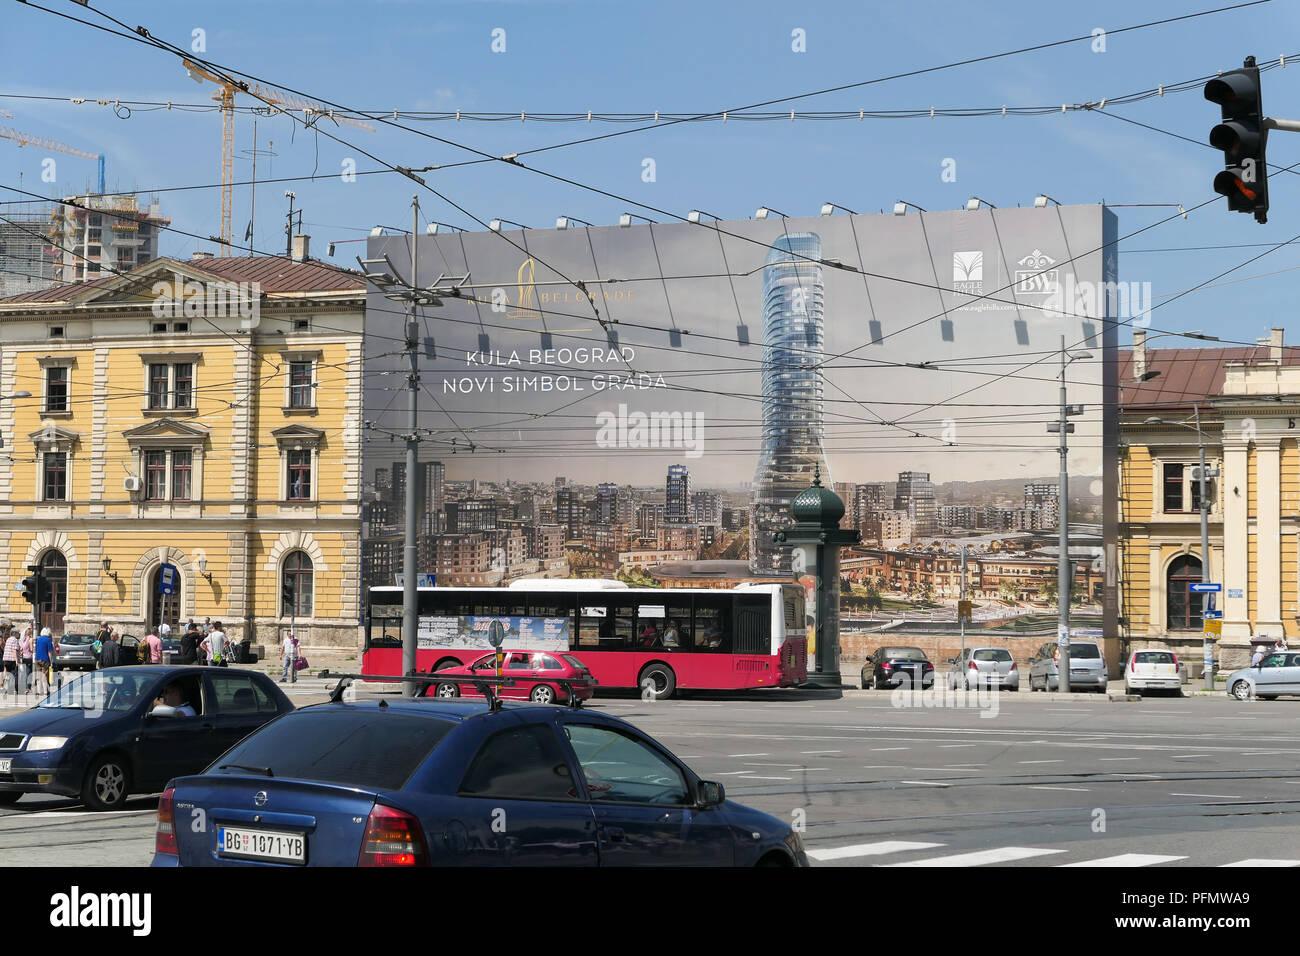 Belgrade Waterfront Development, funded by UAE's Eagle Hills development company, Sava riverside area, Serbia - Stock Image